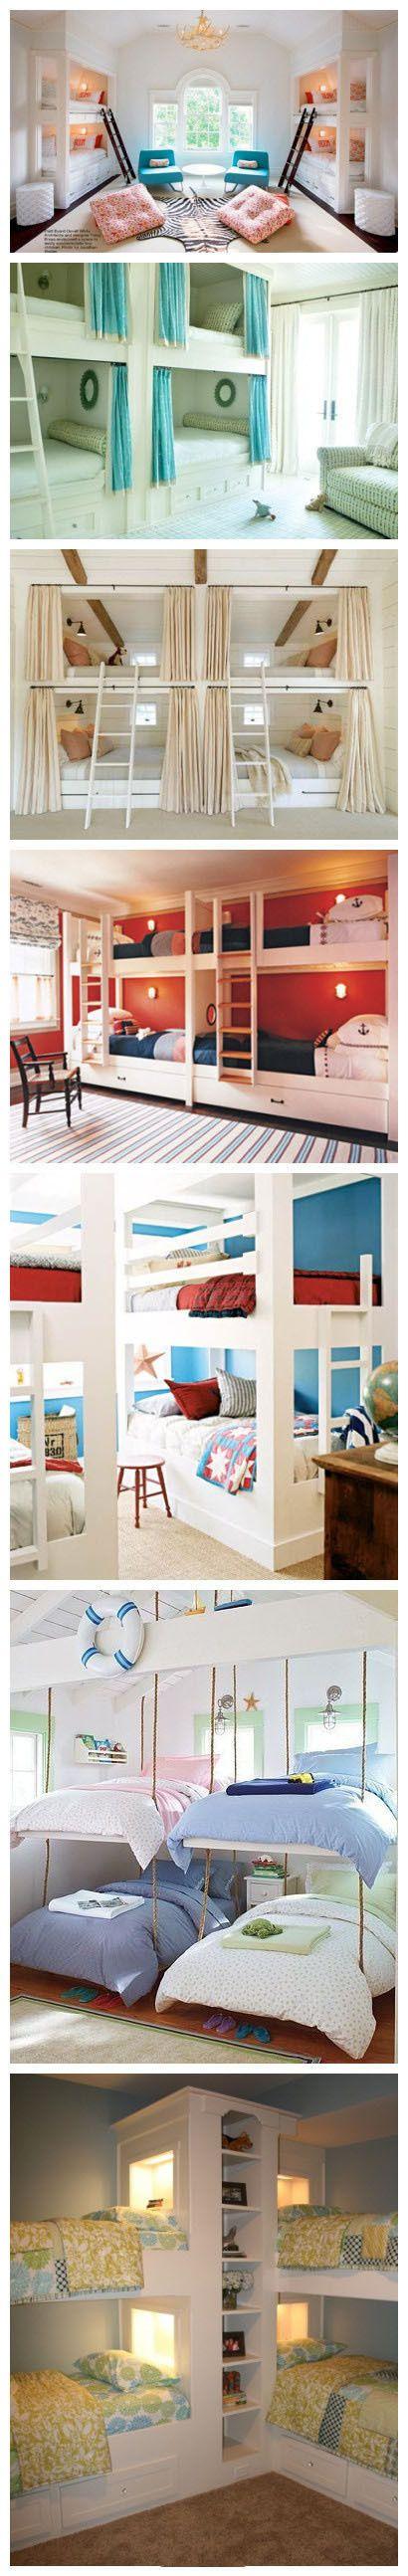 Small room loft bed ideas  Bunk Bed Rooms  Room ideas  Pinterest  Bunk bed Bunk bed rooms